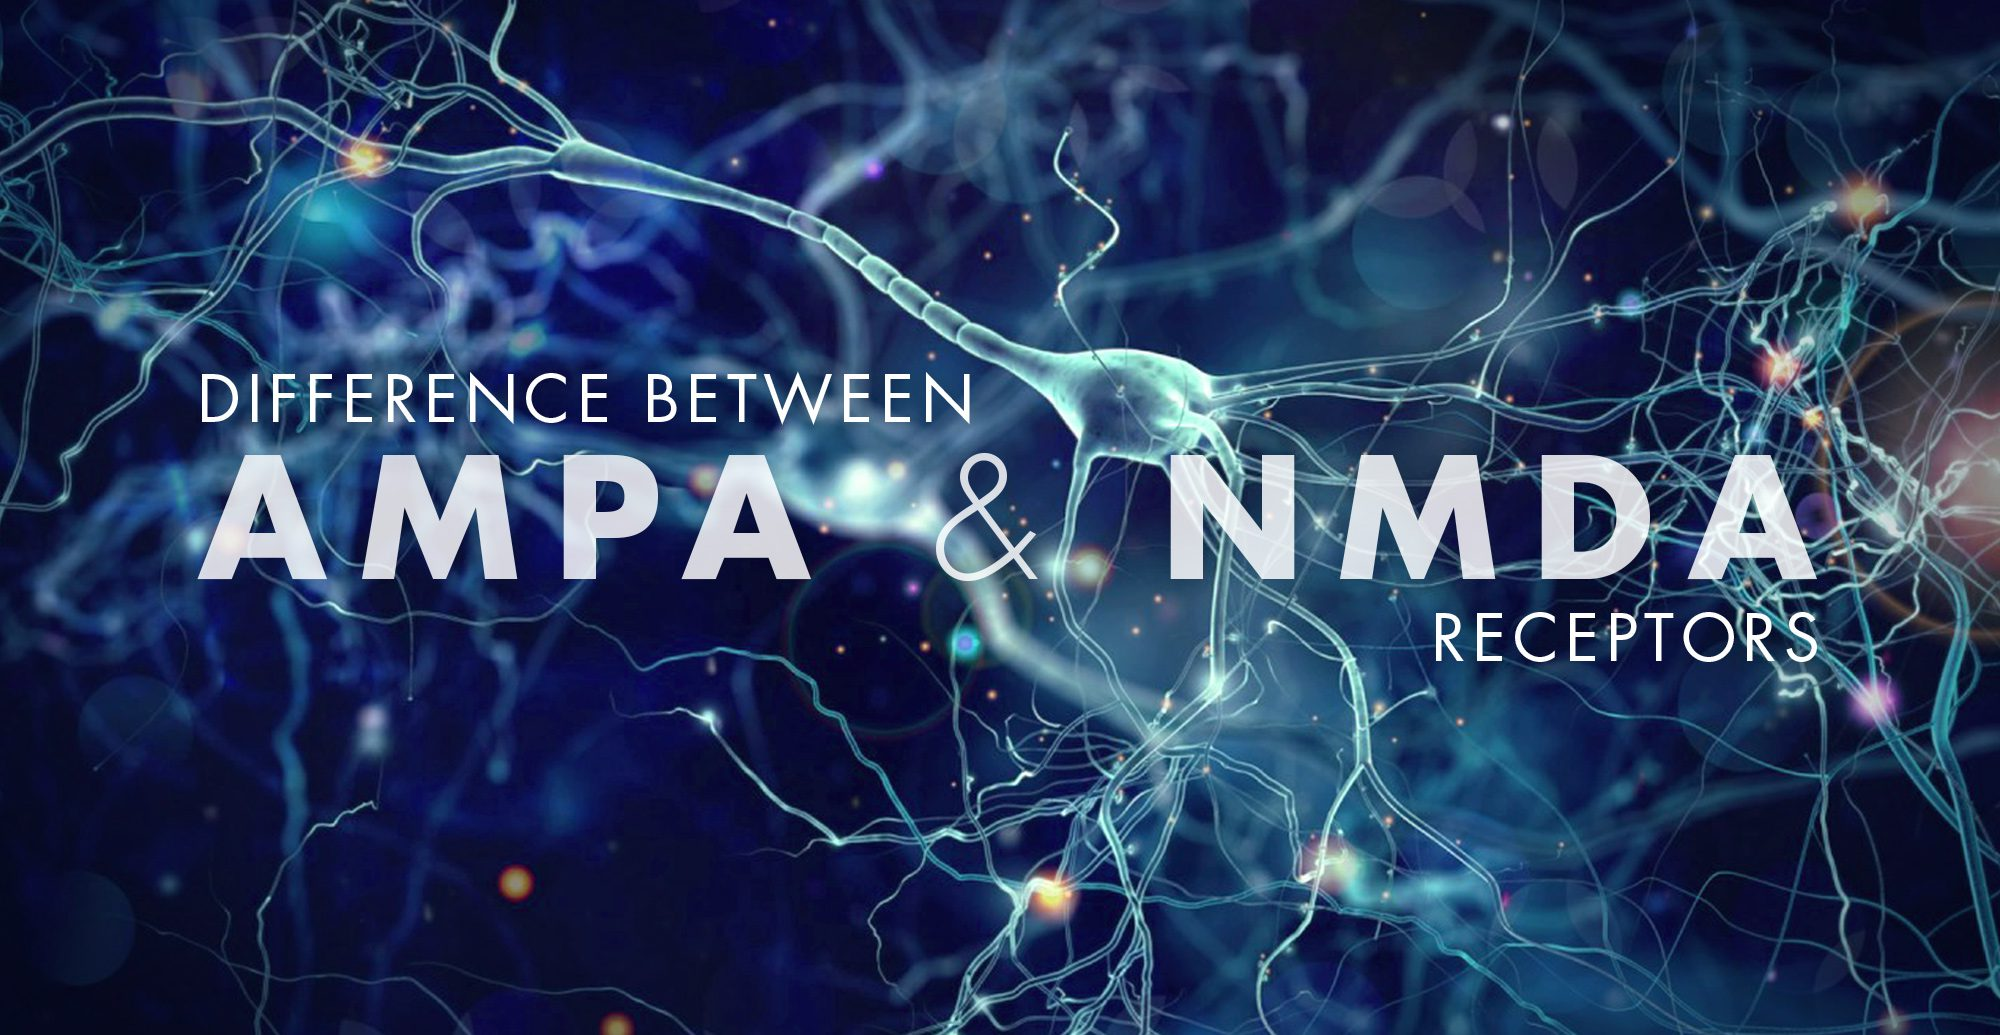 Difference Between AMPA and NMDA Receptors | El Paso, TX Chiropractor